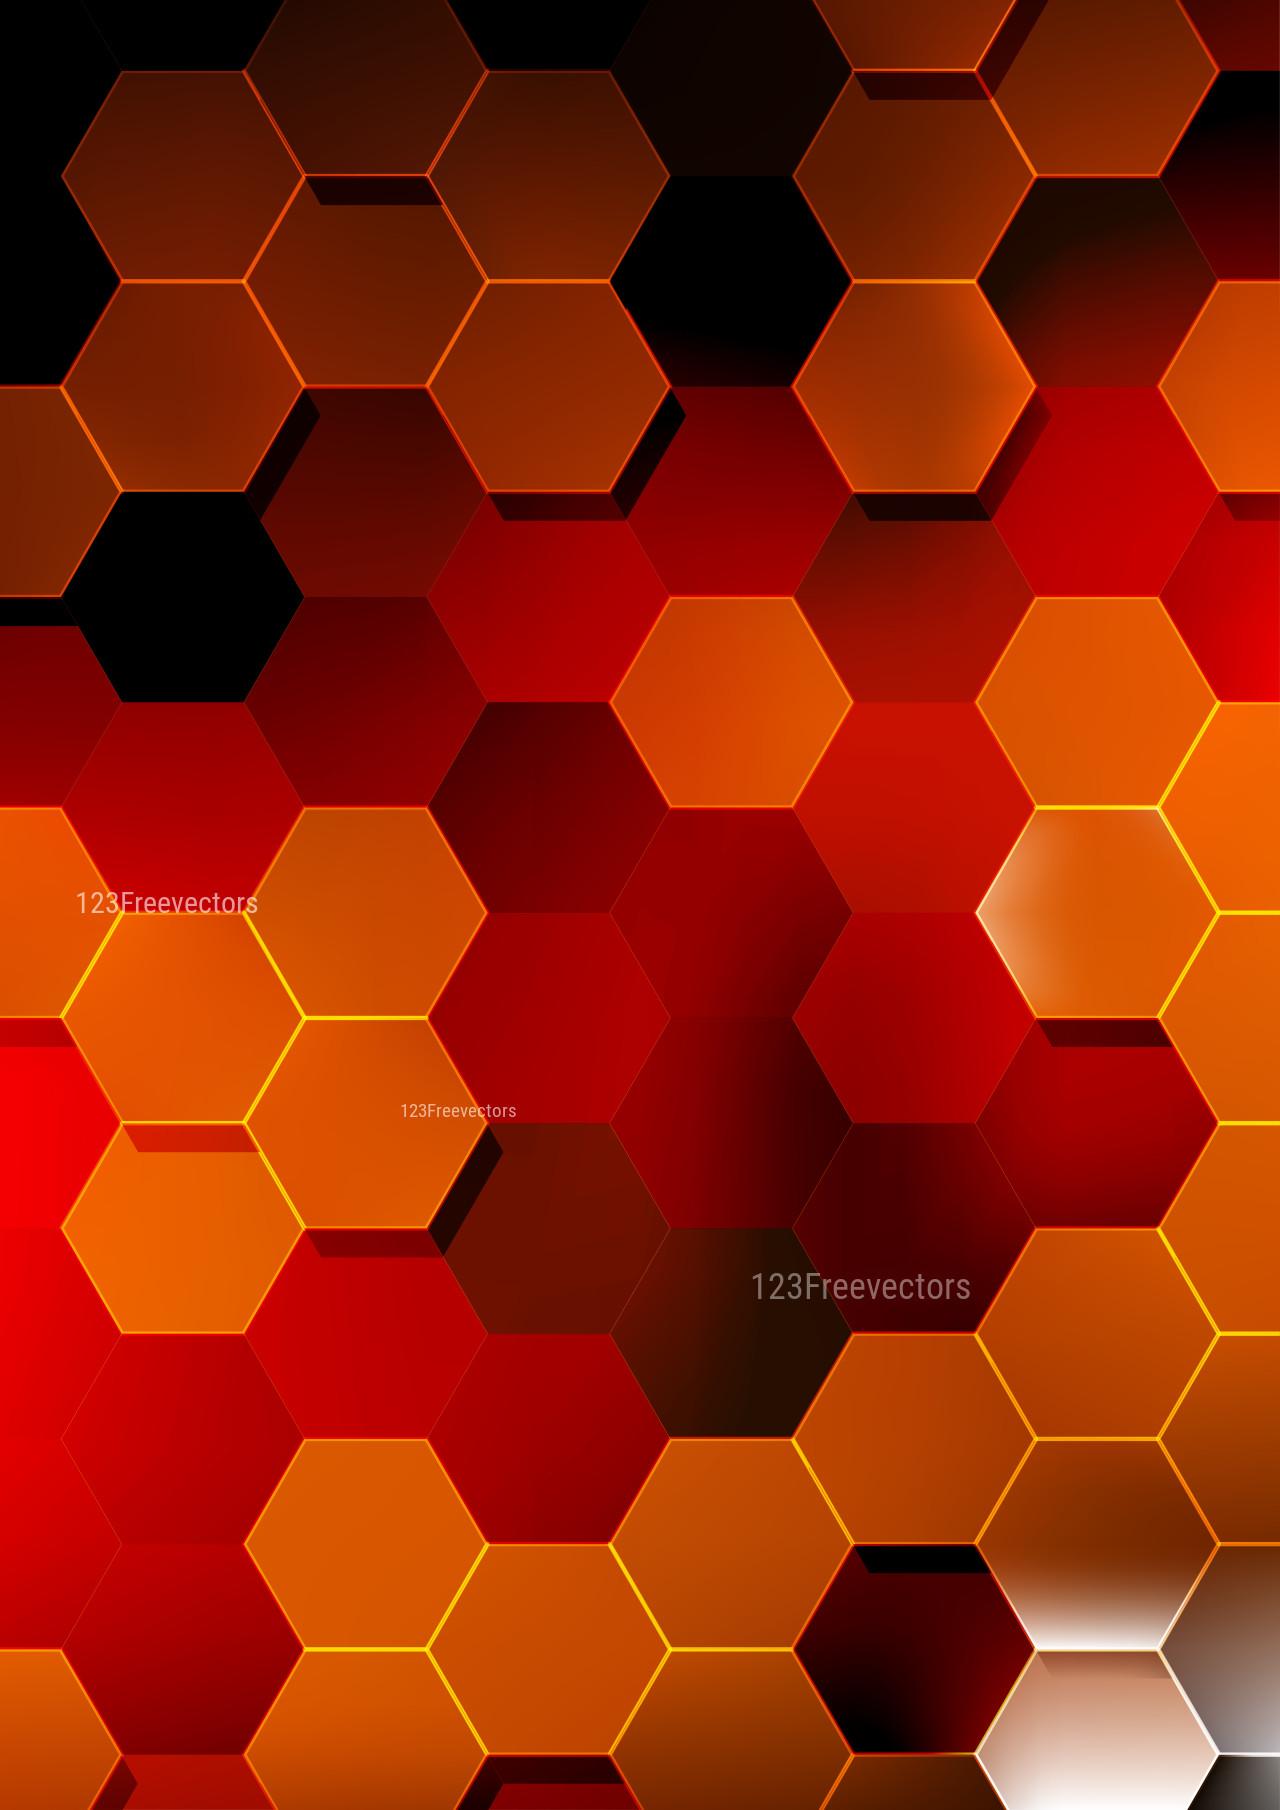 Black Red And Orange Hexagon Background Download the perfect hexagon pictures. black red and orange hexagon background